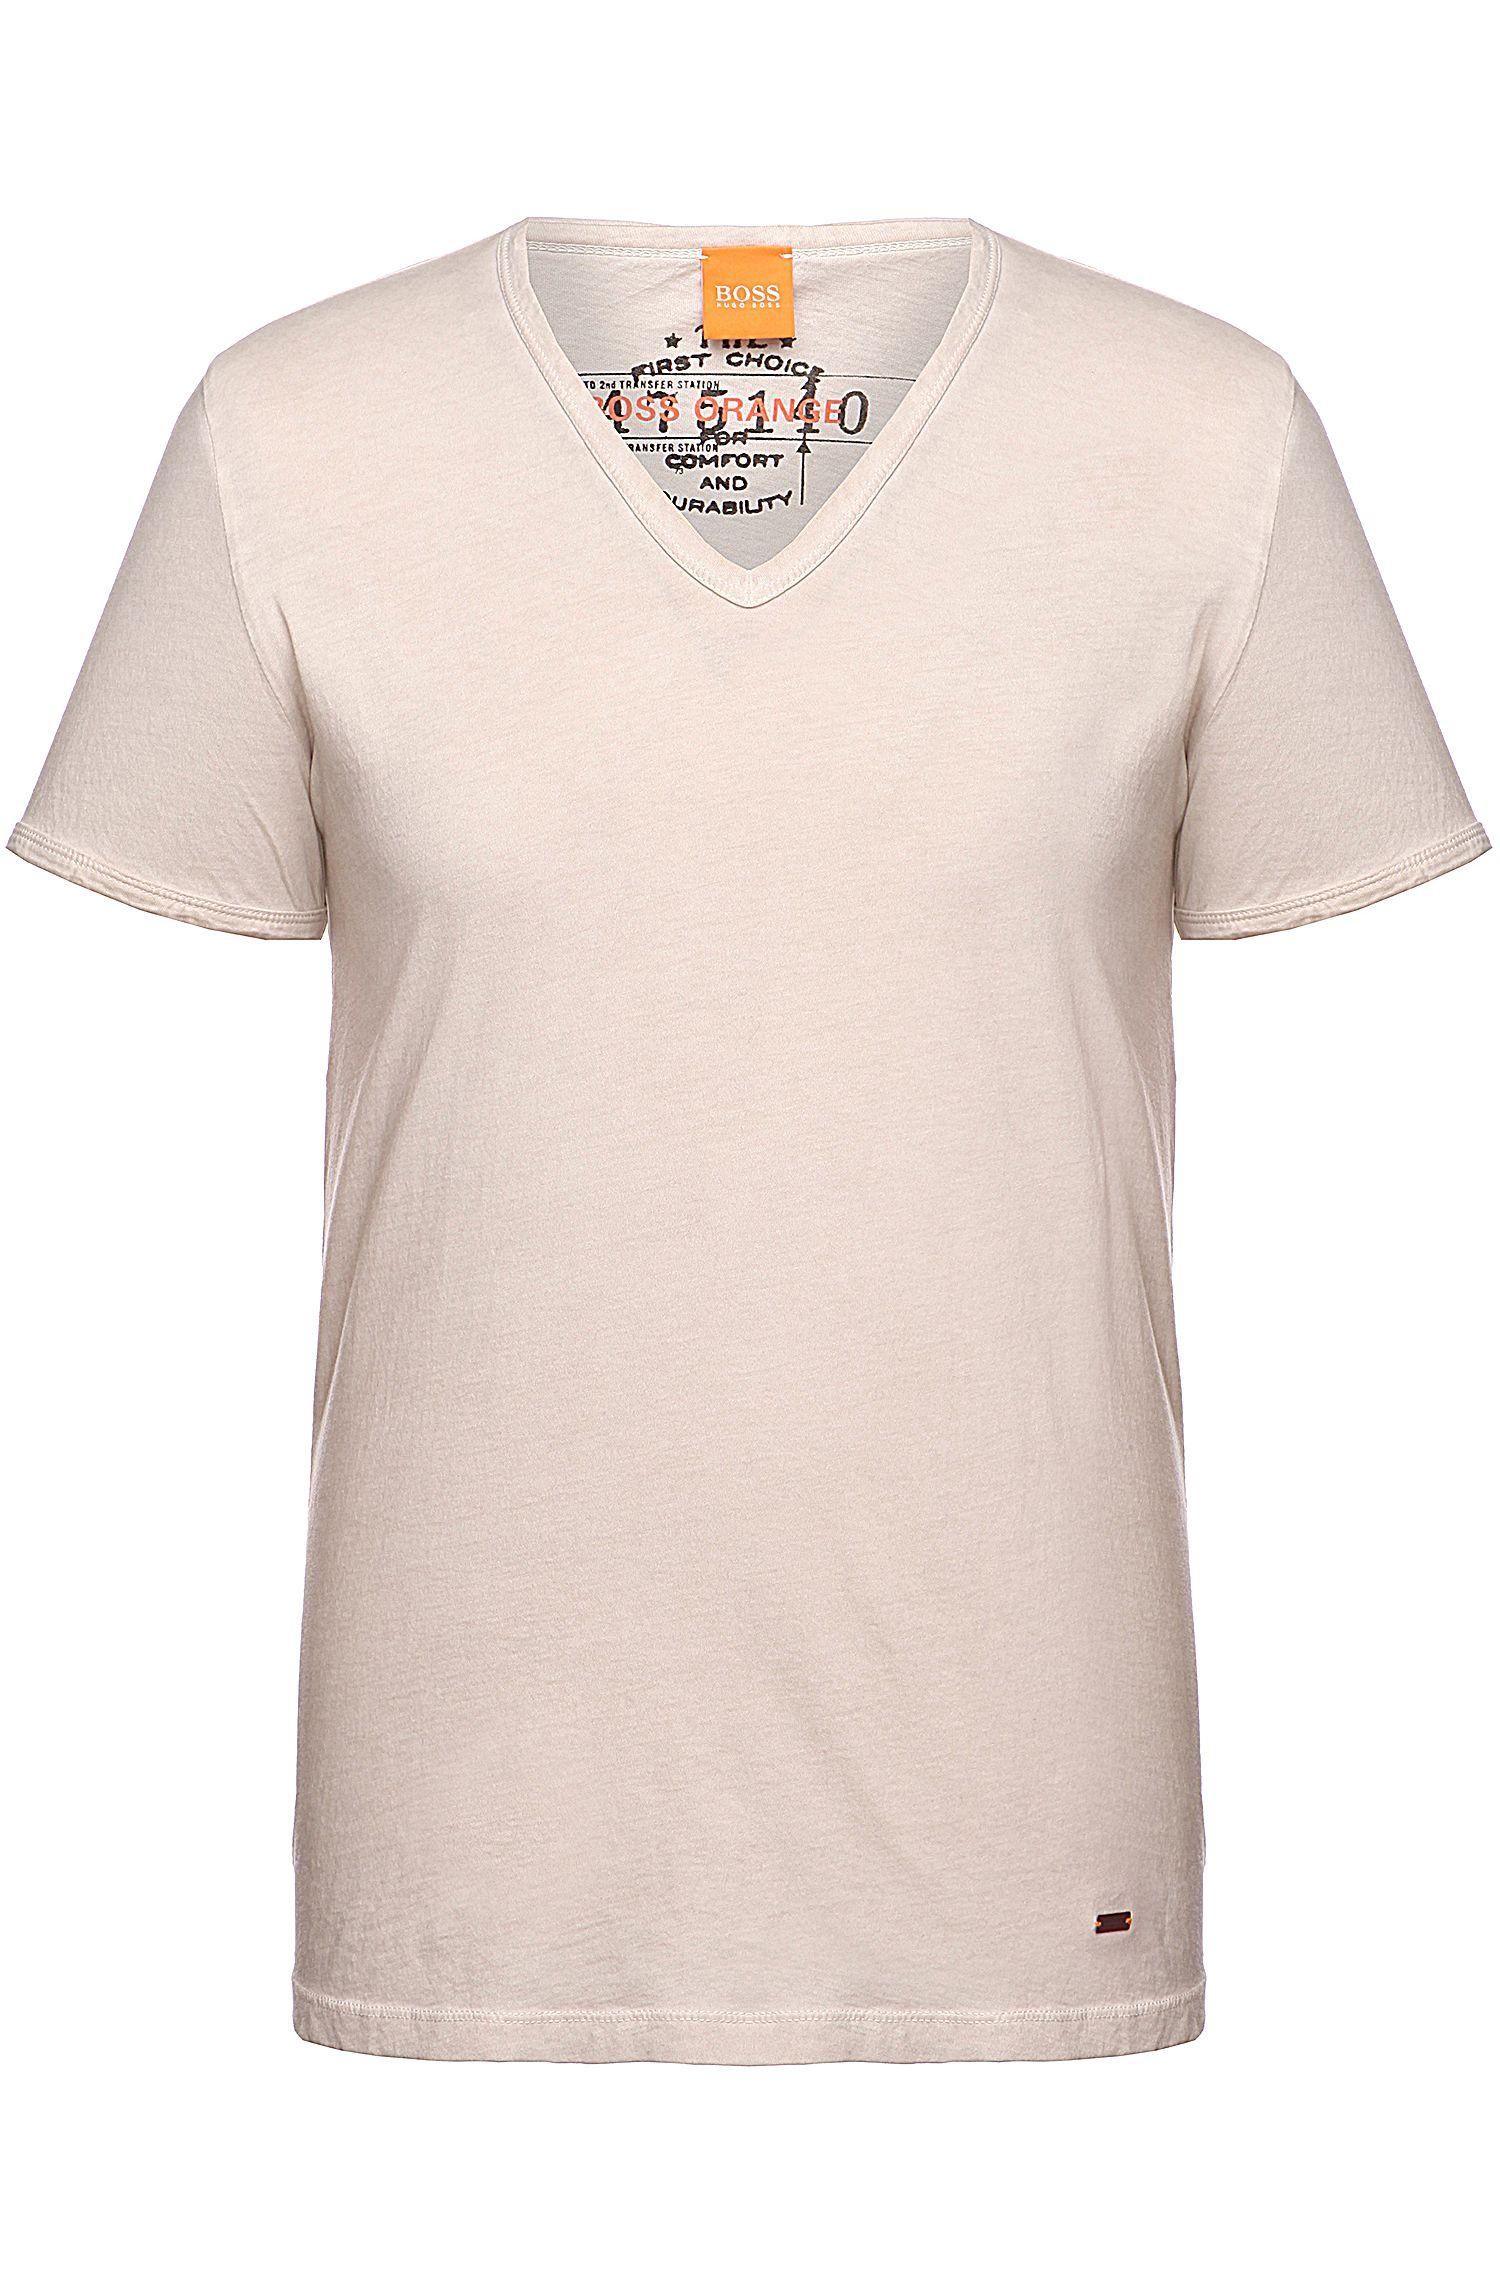 T-shirt BOSS Orange Regular Fit en coton garment dyed